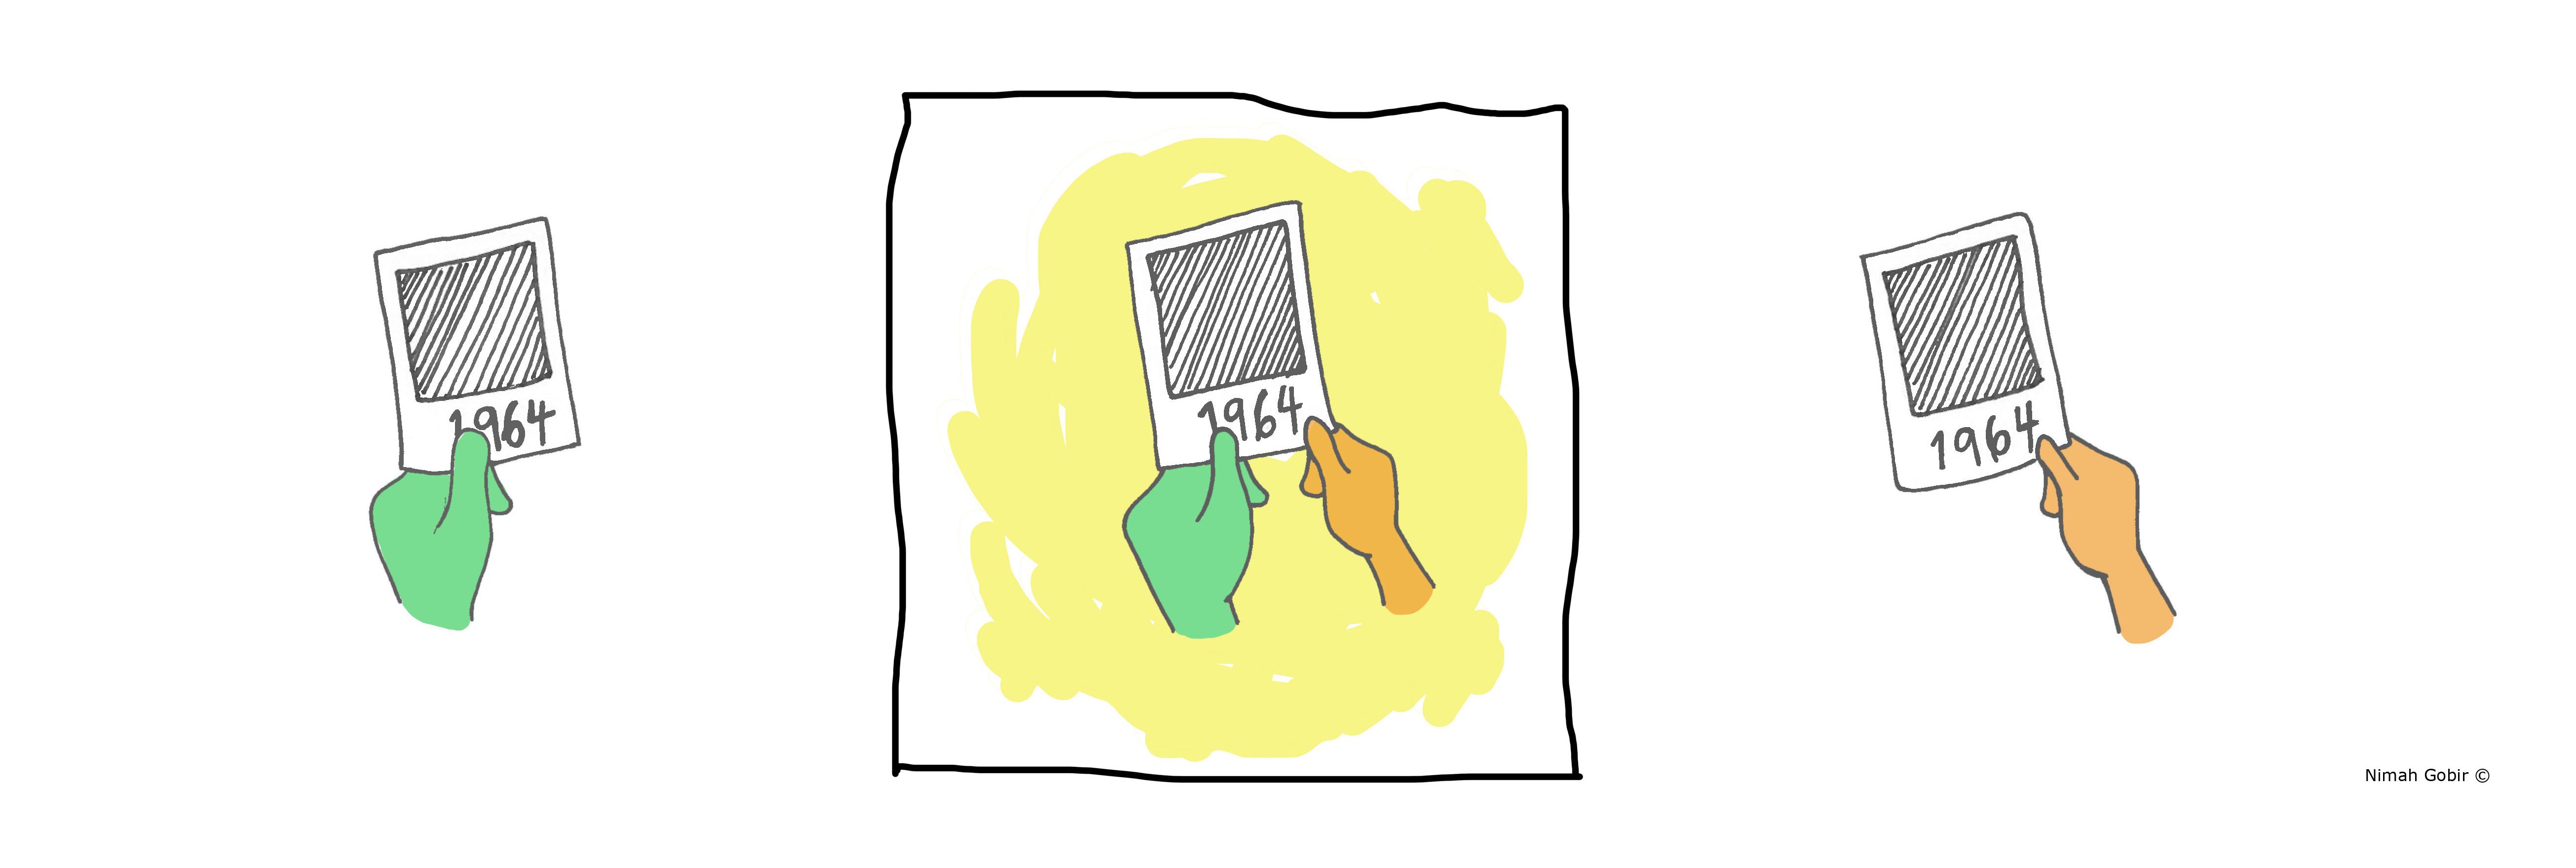 Blog | Project Zero